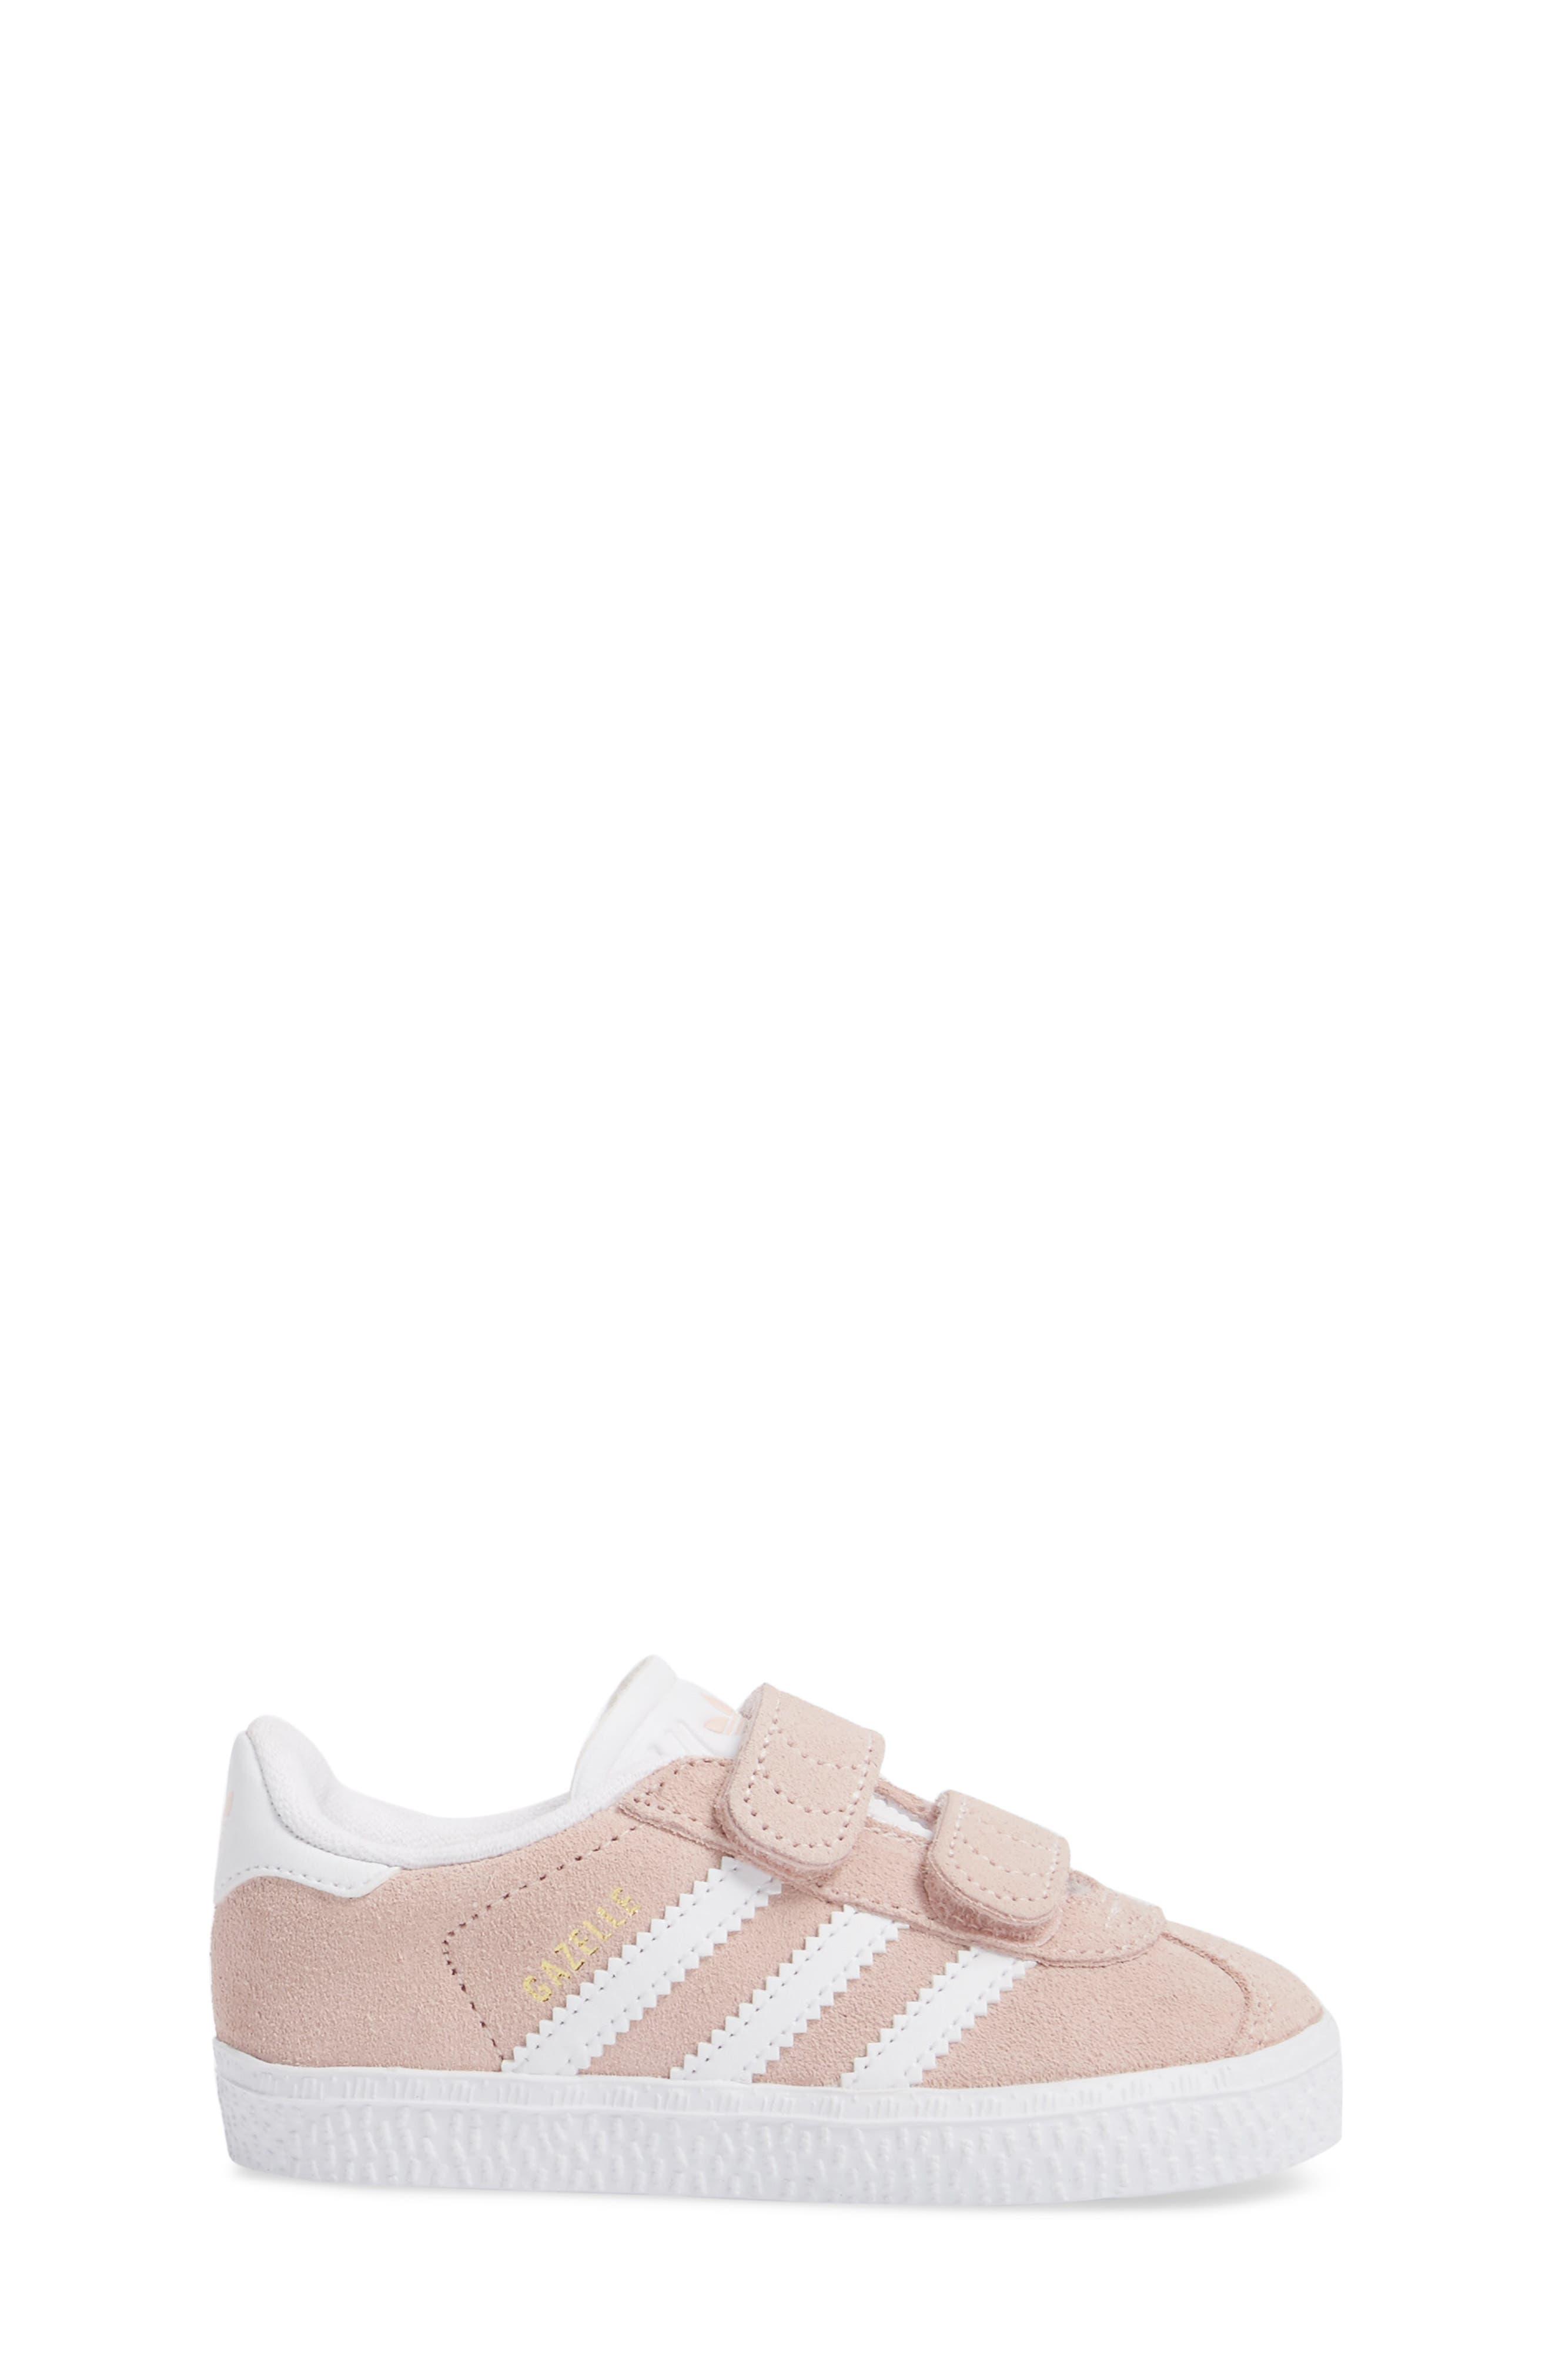 Gazelle Sneaker,                             Alternate thumbnail 3, color,                             Icey Pink / White / White